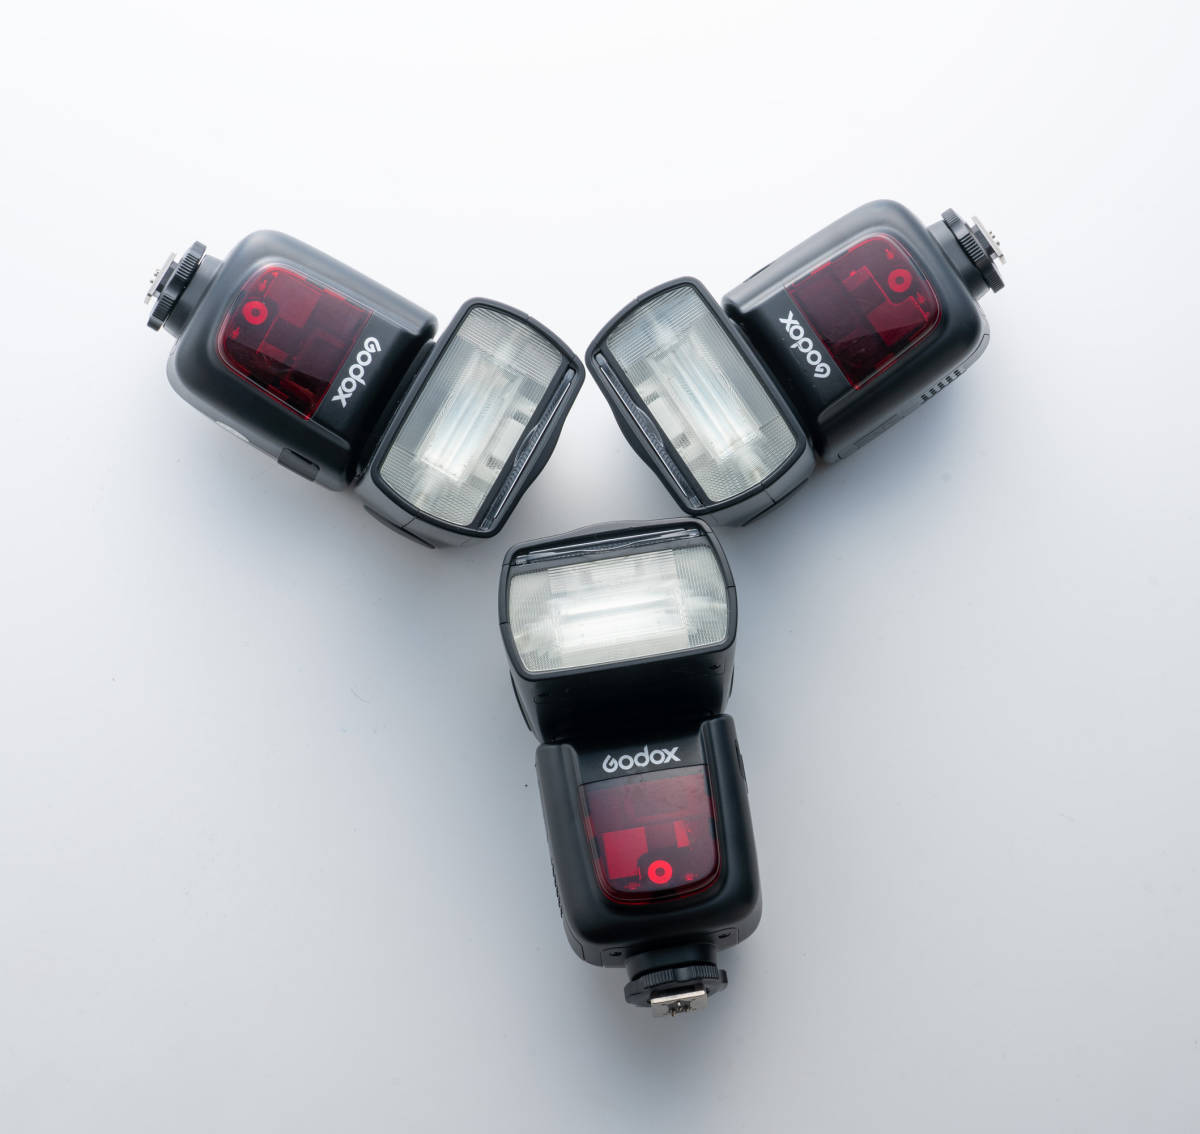 GODOX ストロボ V860ⅡF 3灯セット + GODOX コマンダー X-Pro F 予備バッテリー VB18 2個付き 富士フイルム用_画像2